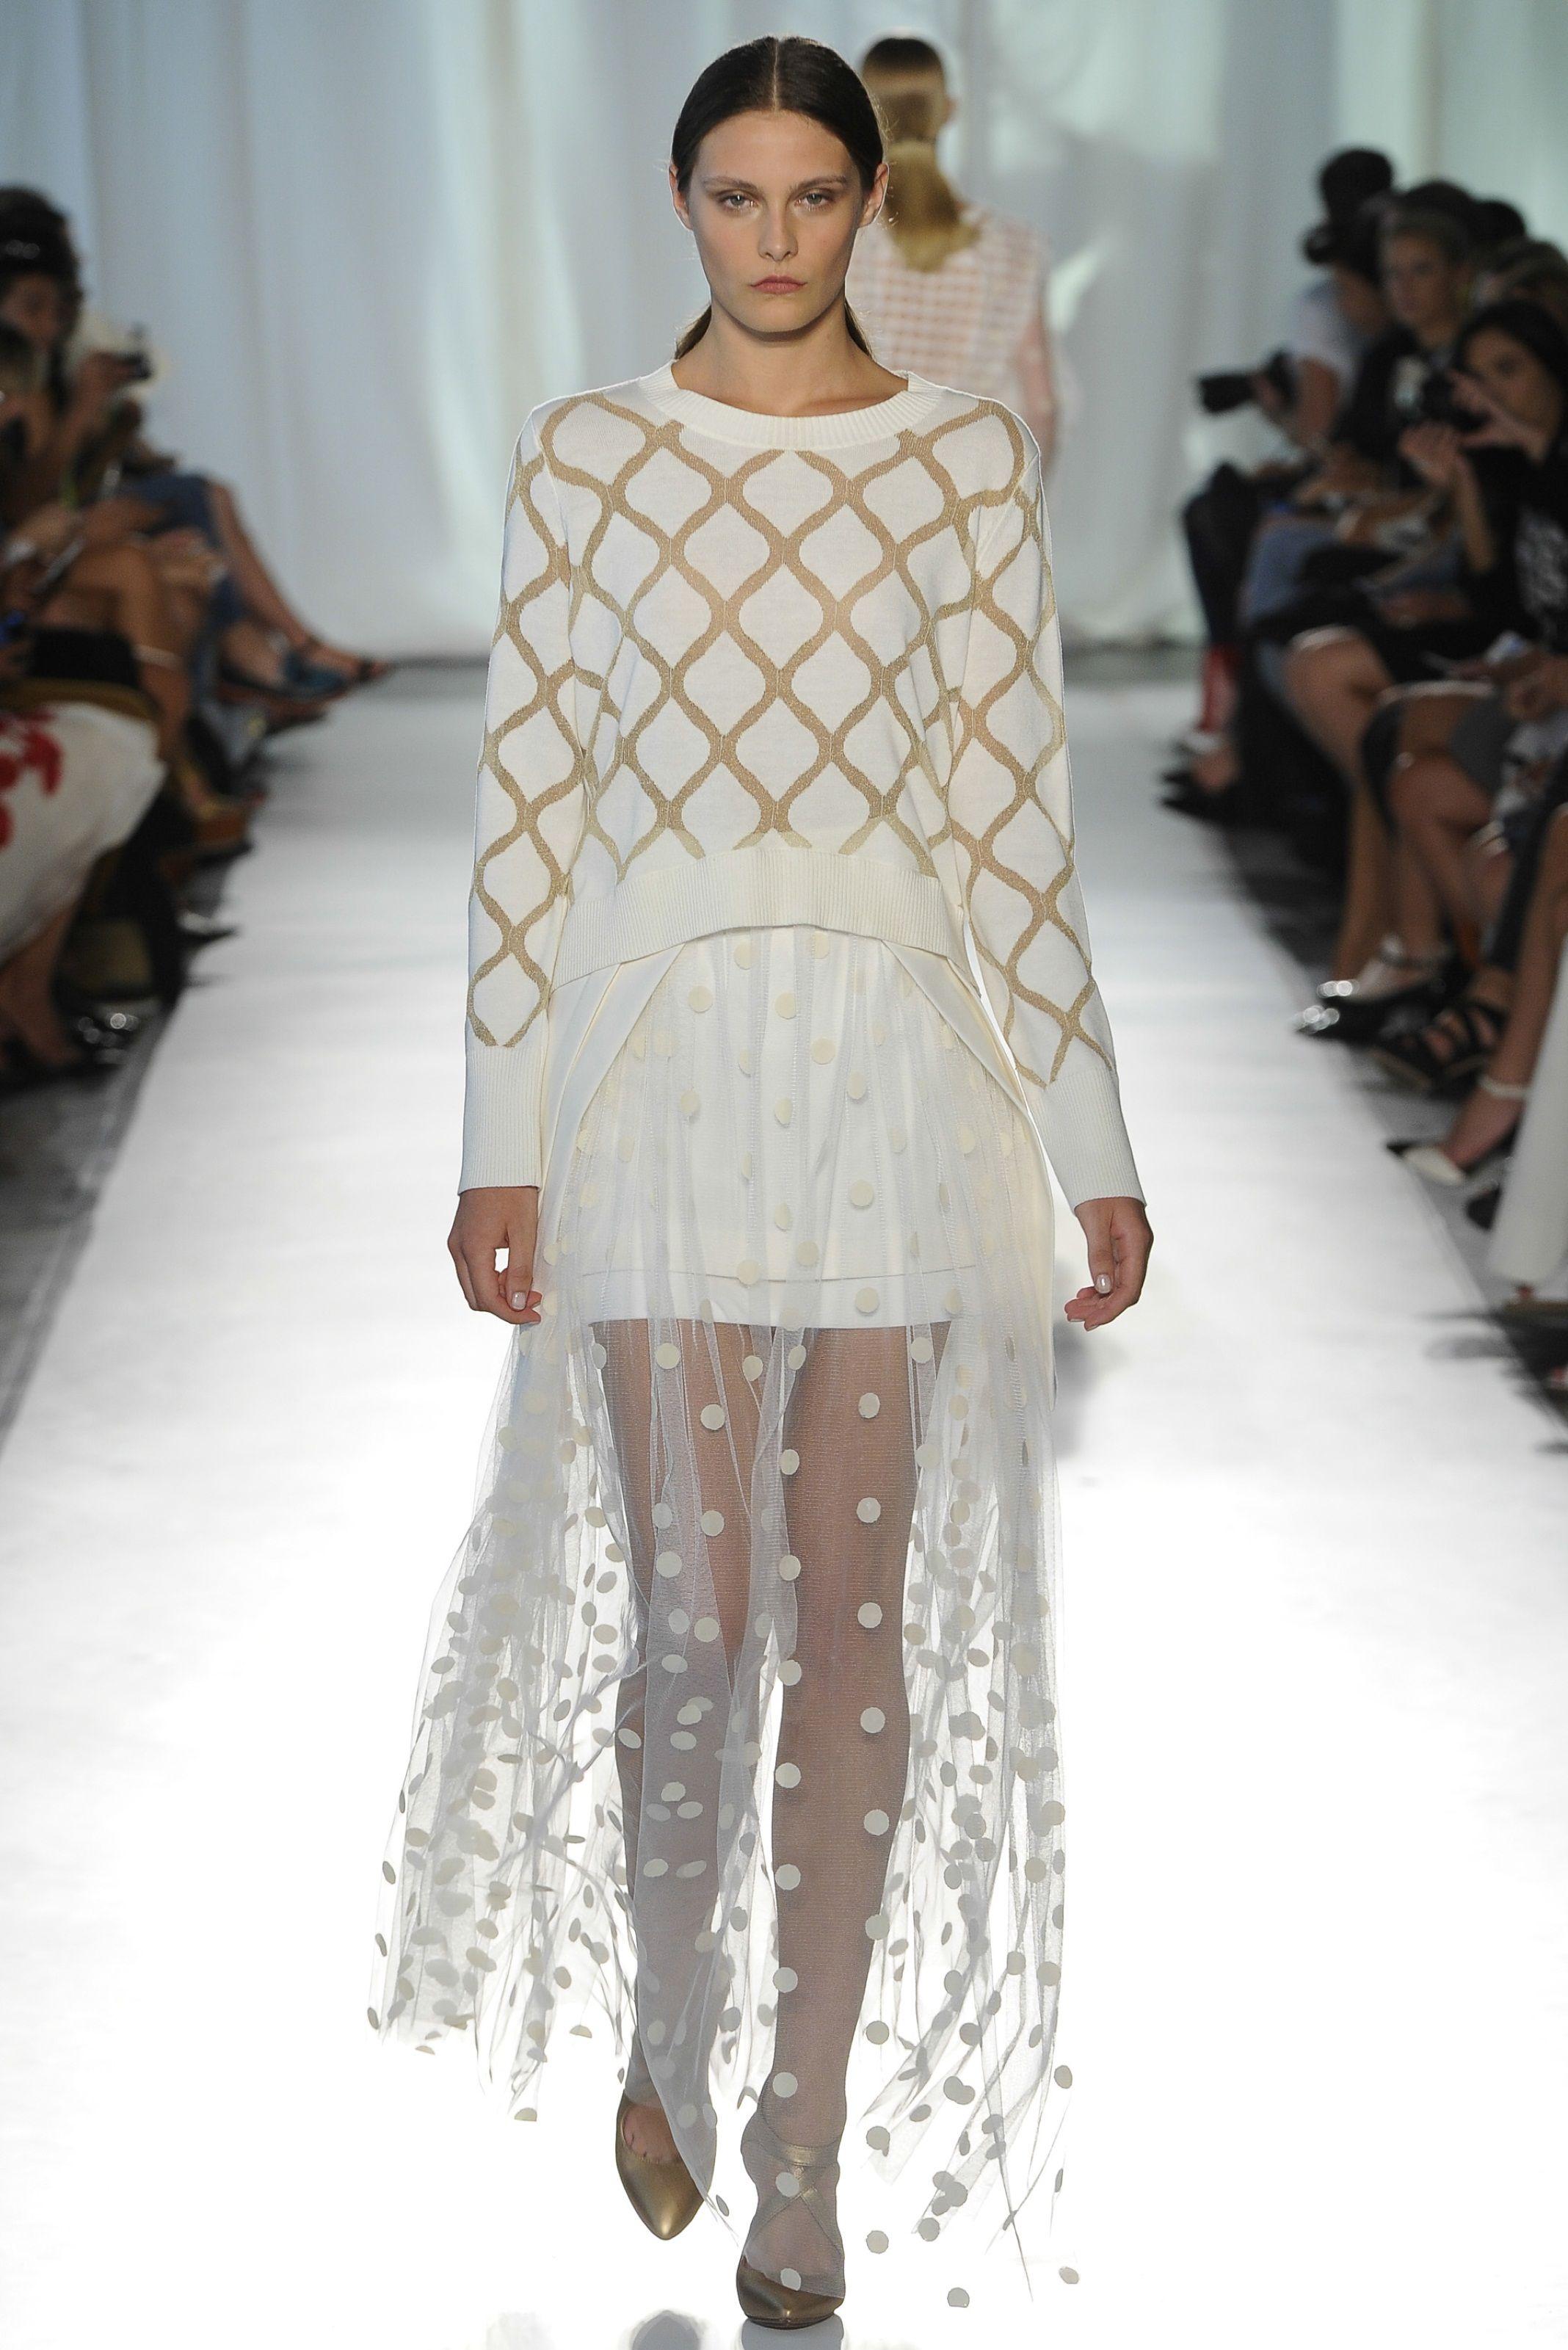 Sass Bide SpringSummer 2014 RTW – New York Fashion Week